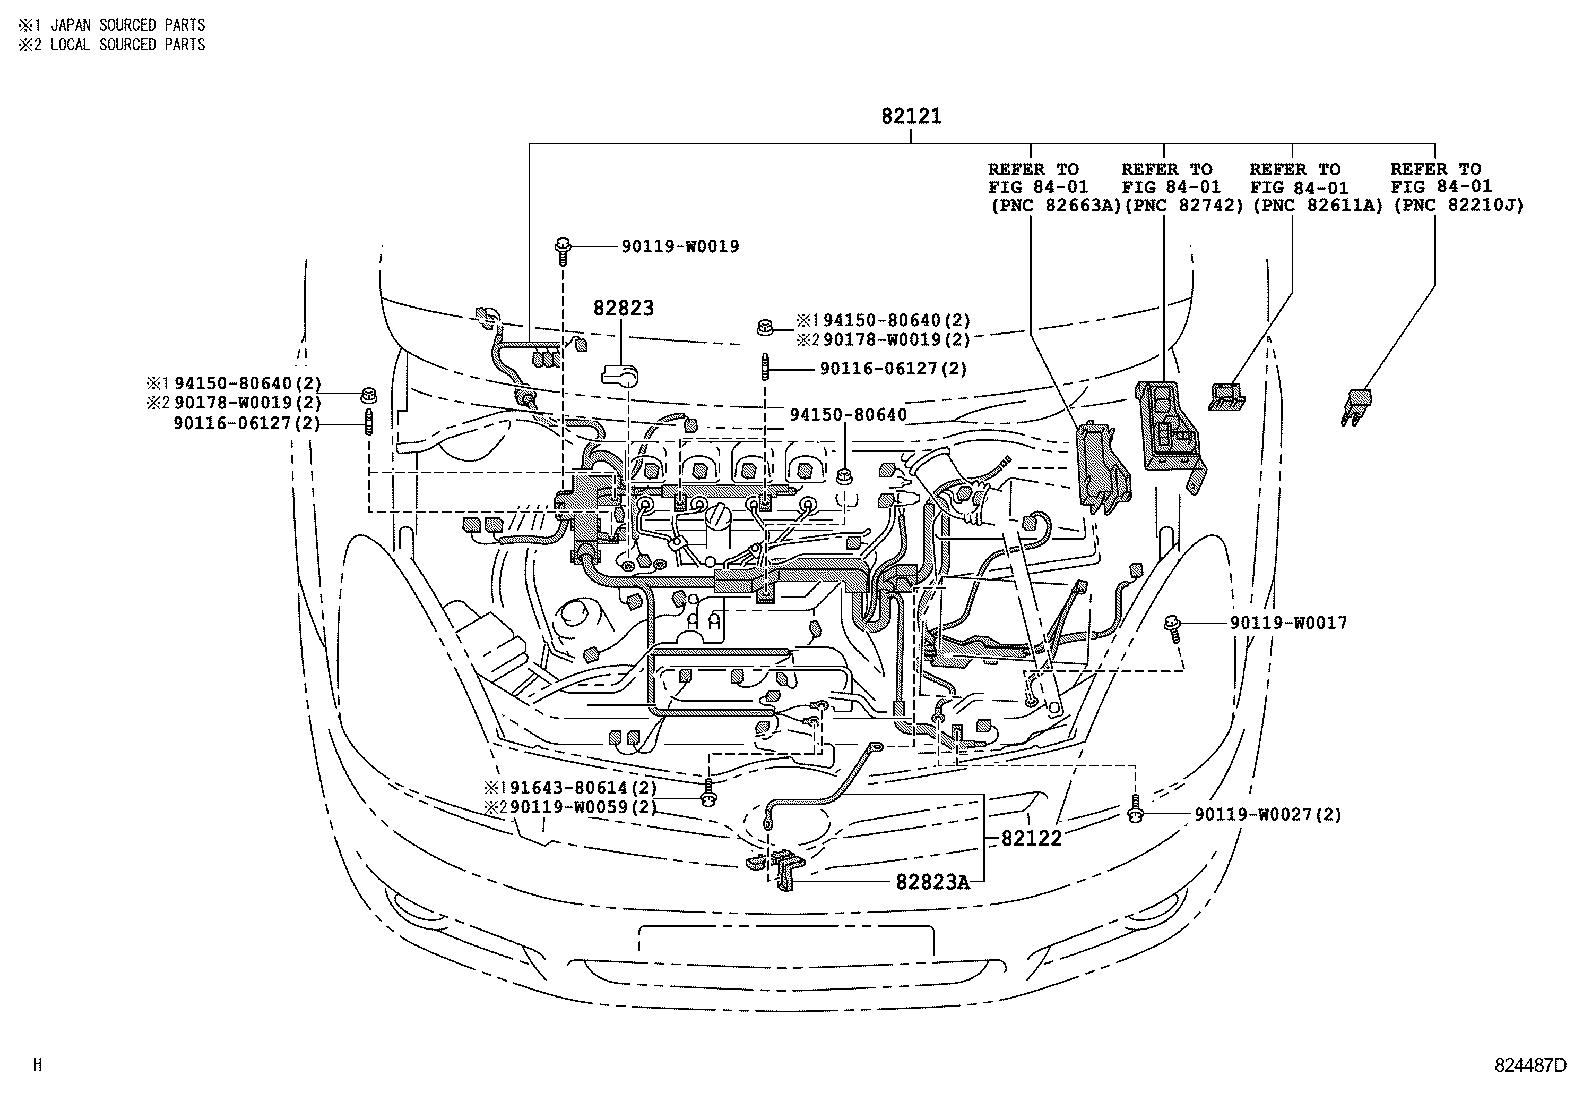 Toyota Corolla Versoaur10l-grfexw - Electrical